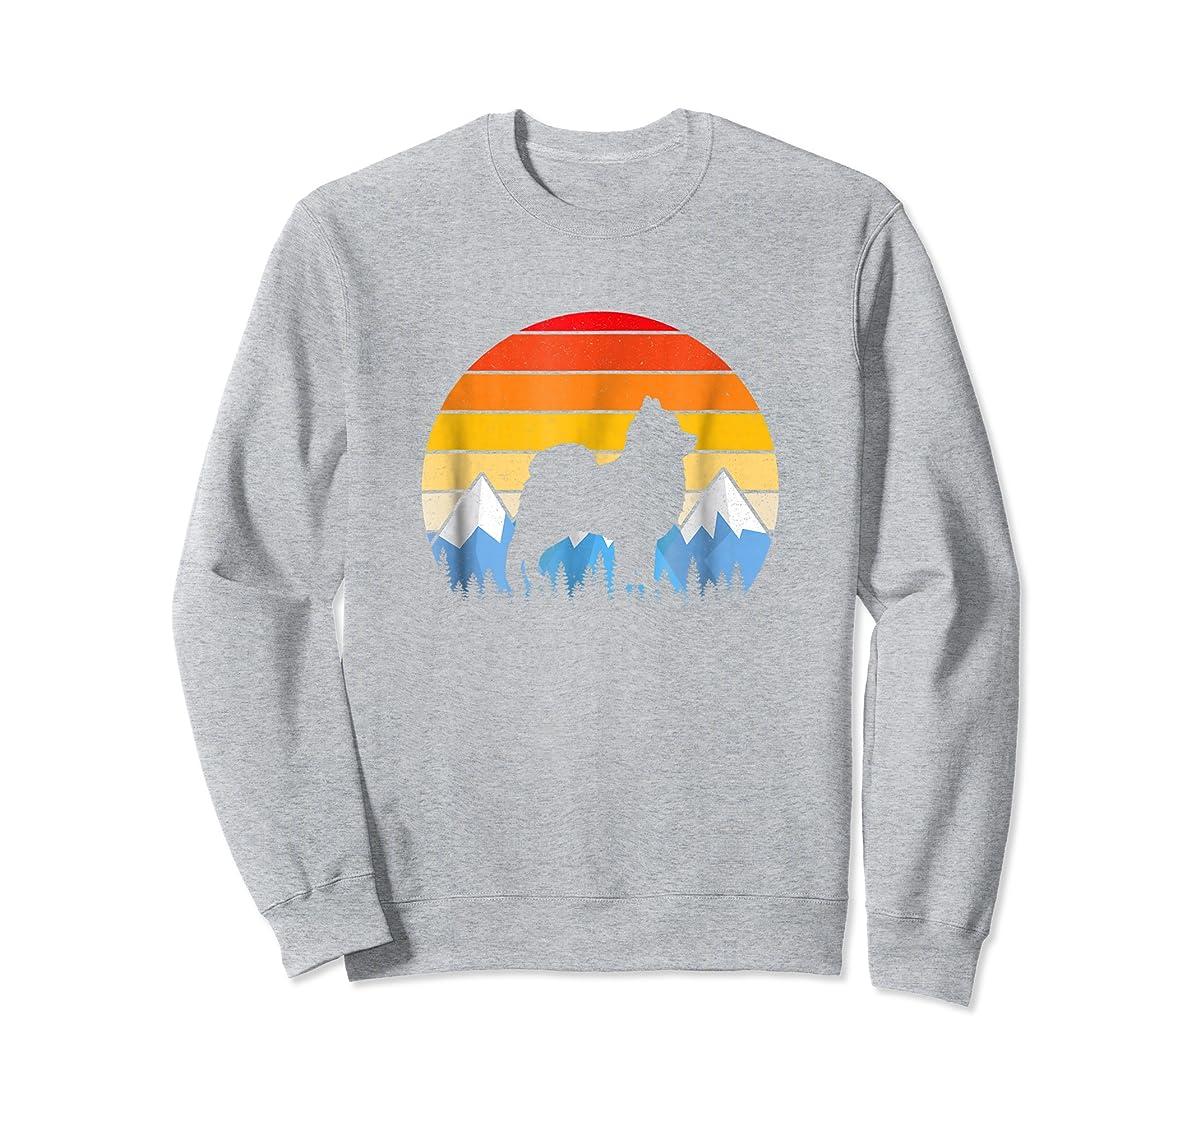 Vintage Retro Pomeranian Lovers Gifts Pomeranian T Shirts-Sweatshirt-Sport Grey